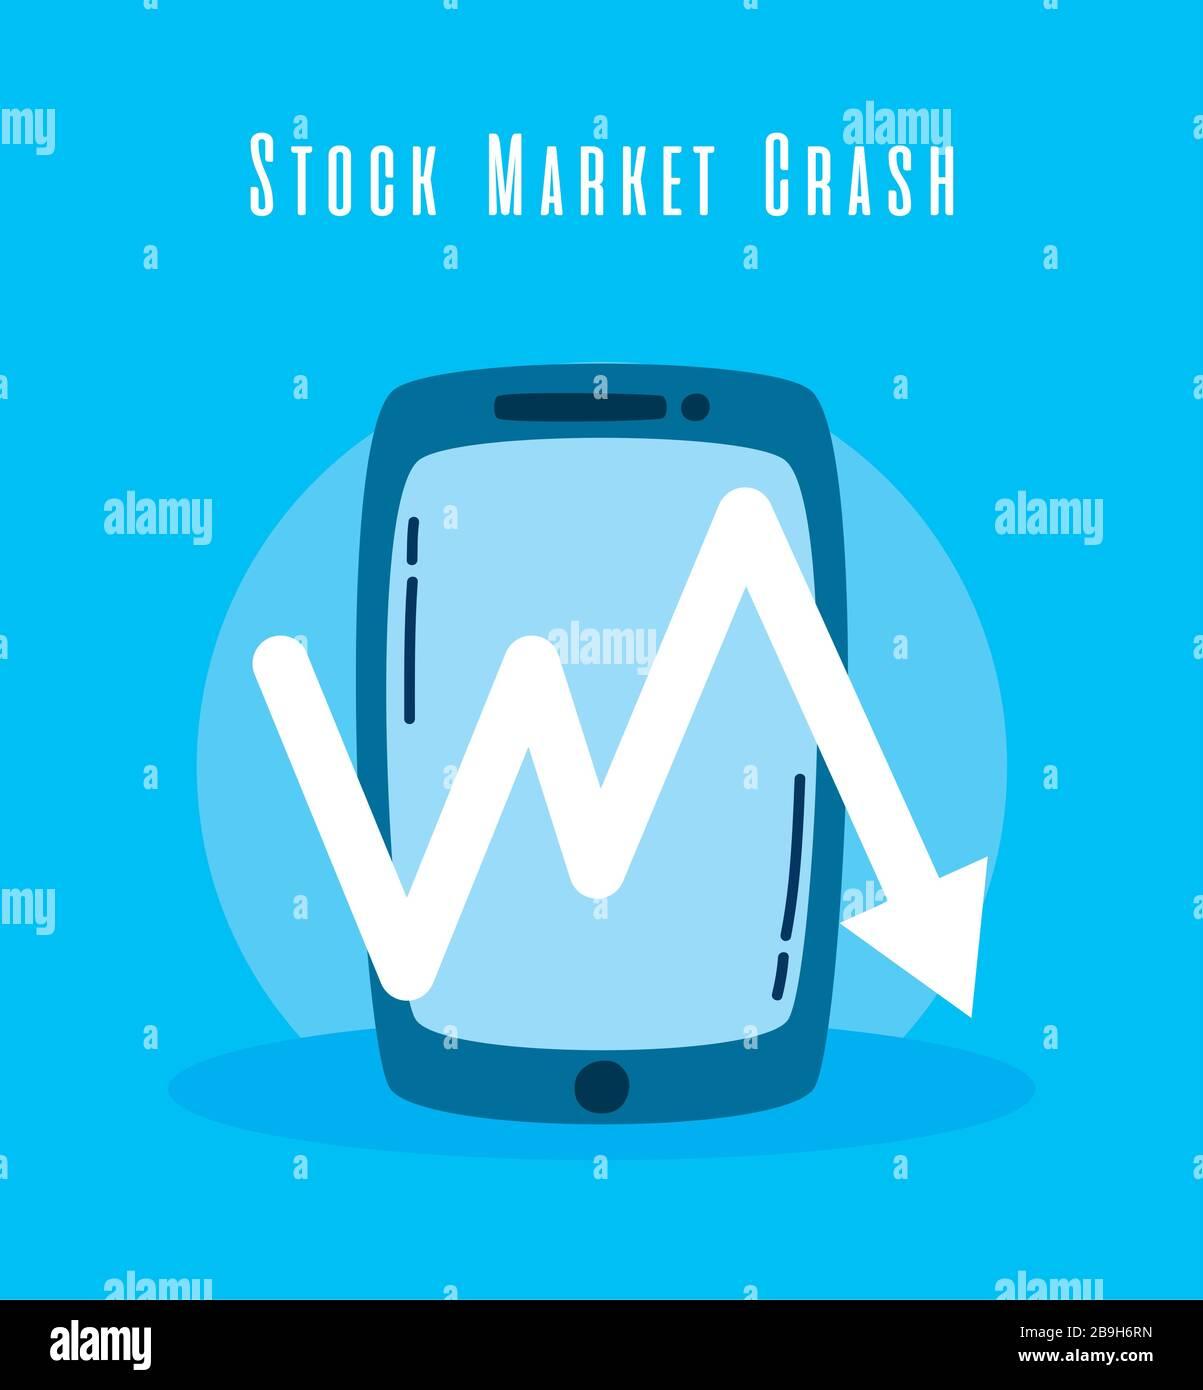 Smartphone Amd Arrow Down Stock Market Crash Stock Vector Image Art Alamy